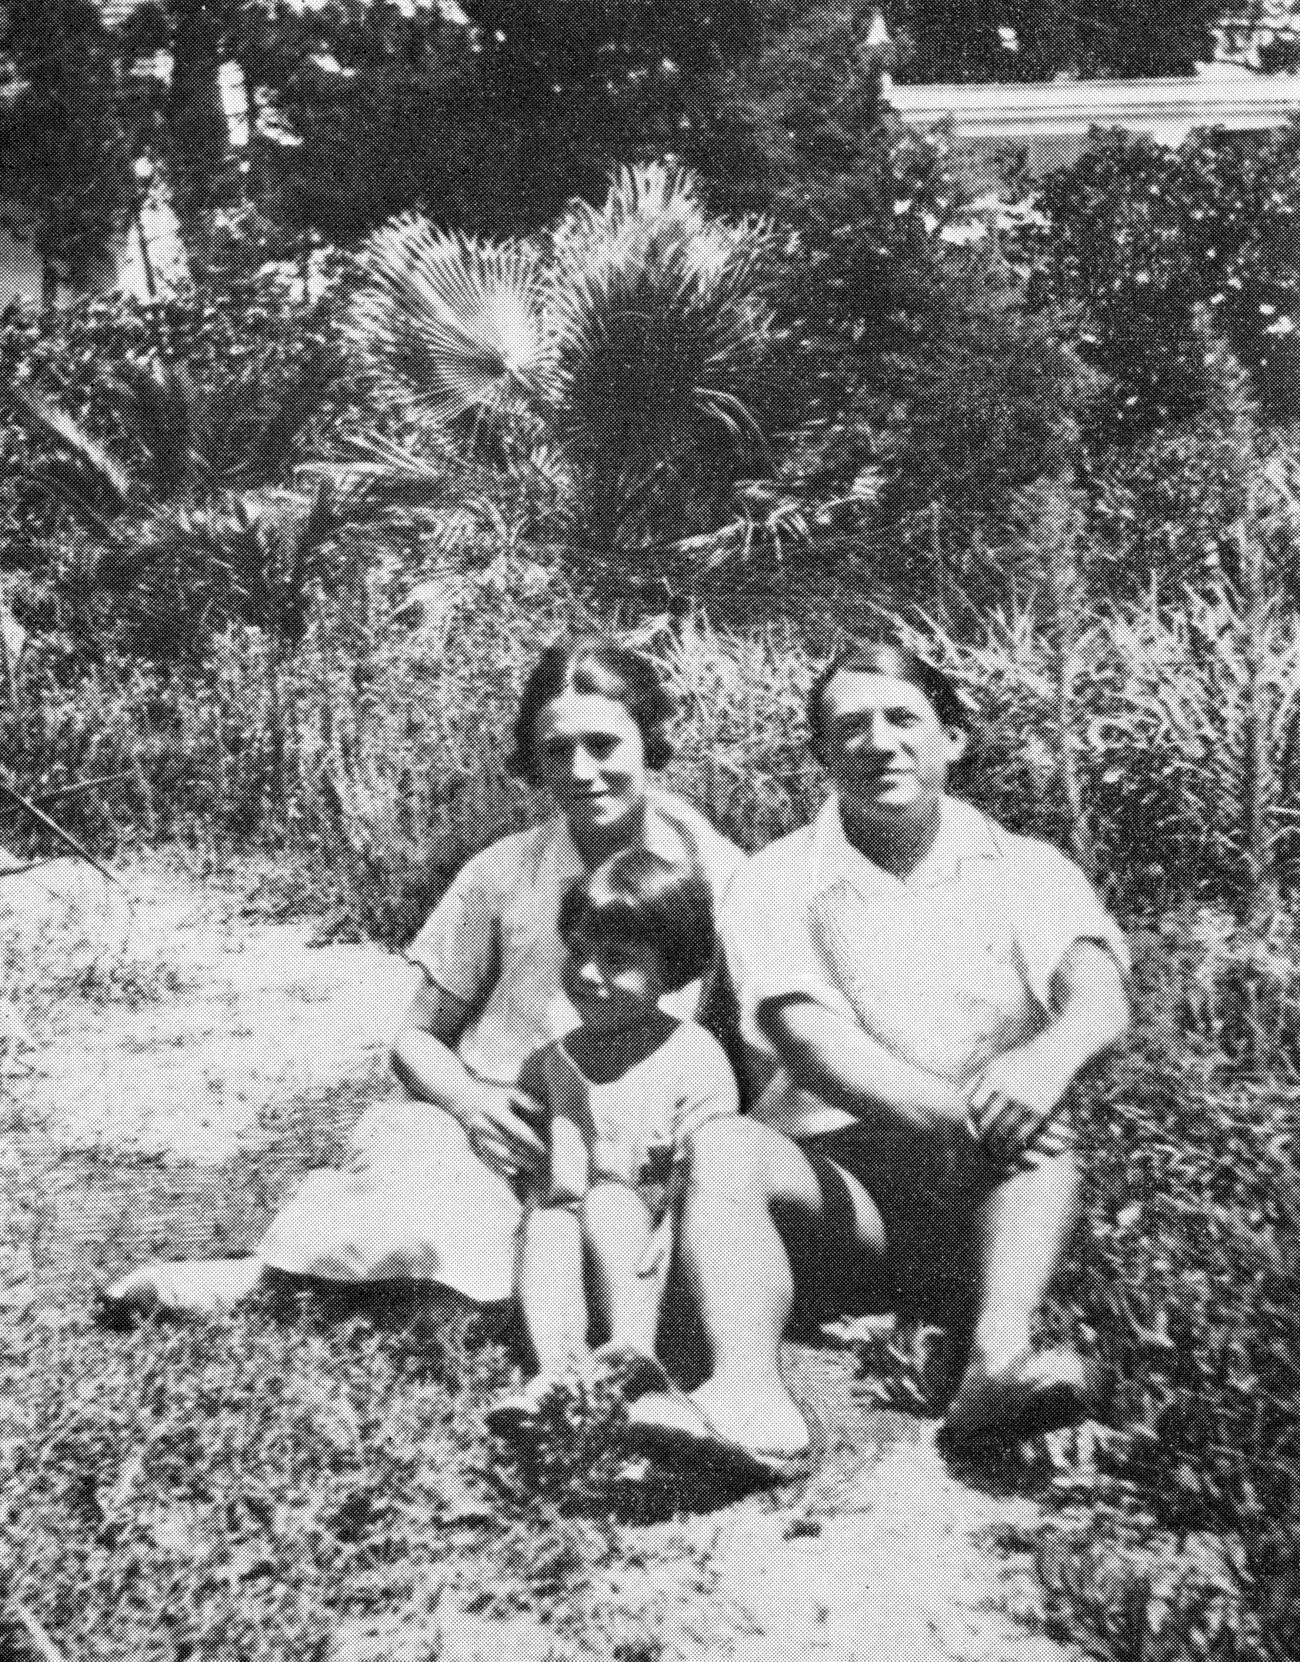 Olga Khokhlova, Pablo Picasso et leur fils Paulo. Photo d'archive